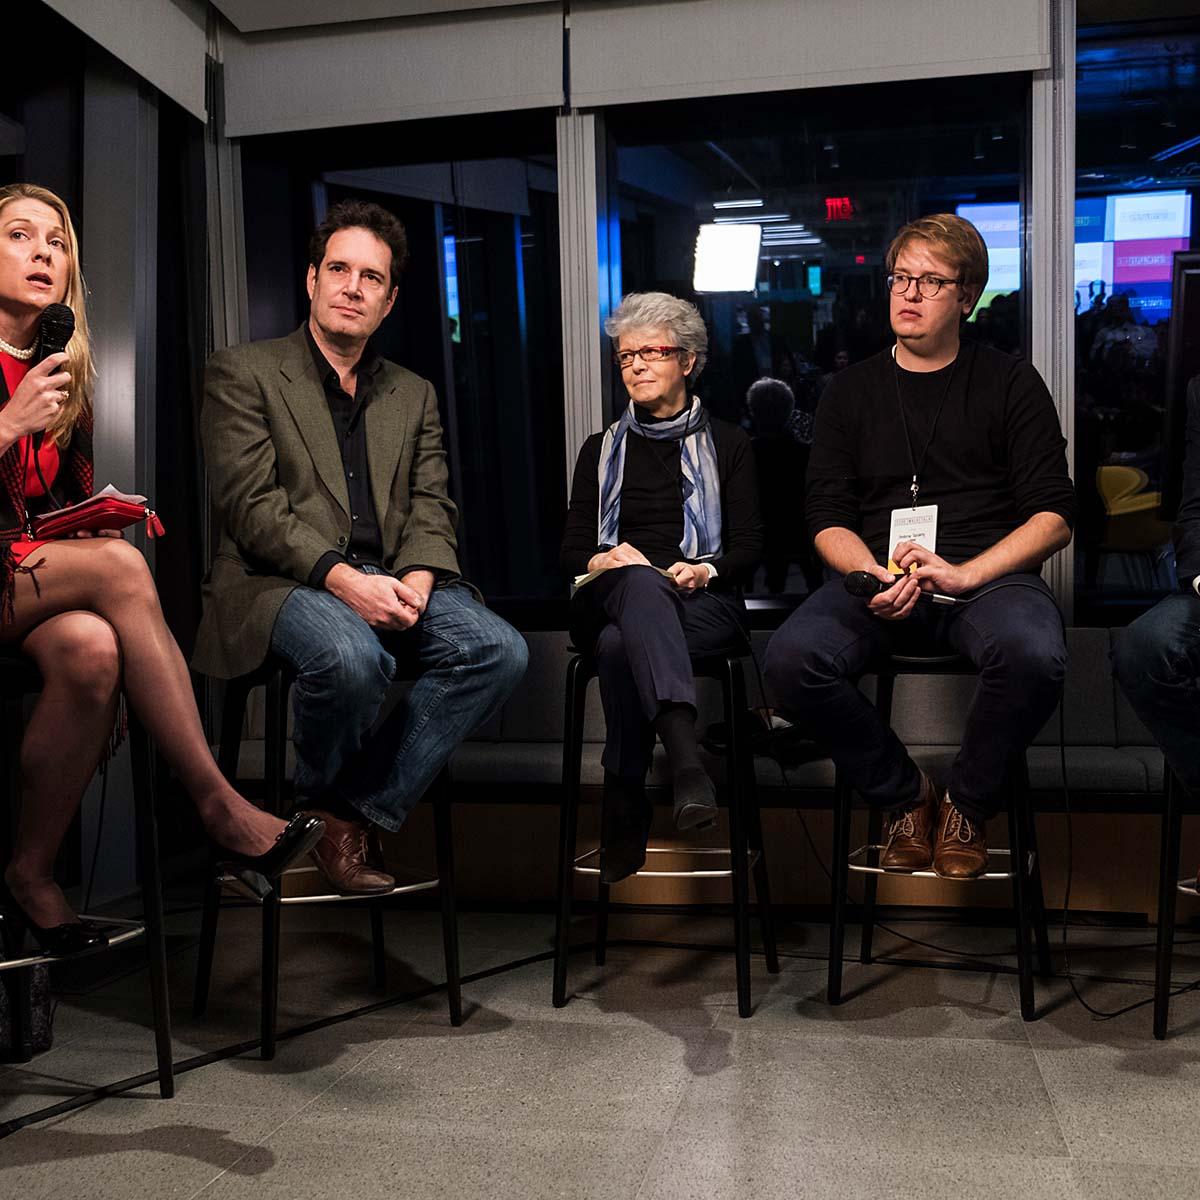 Panel event